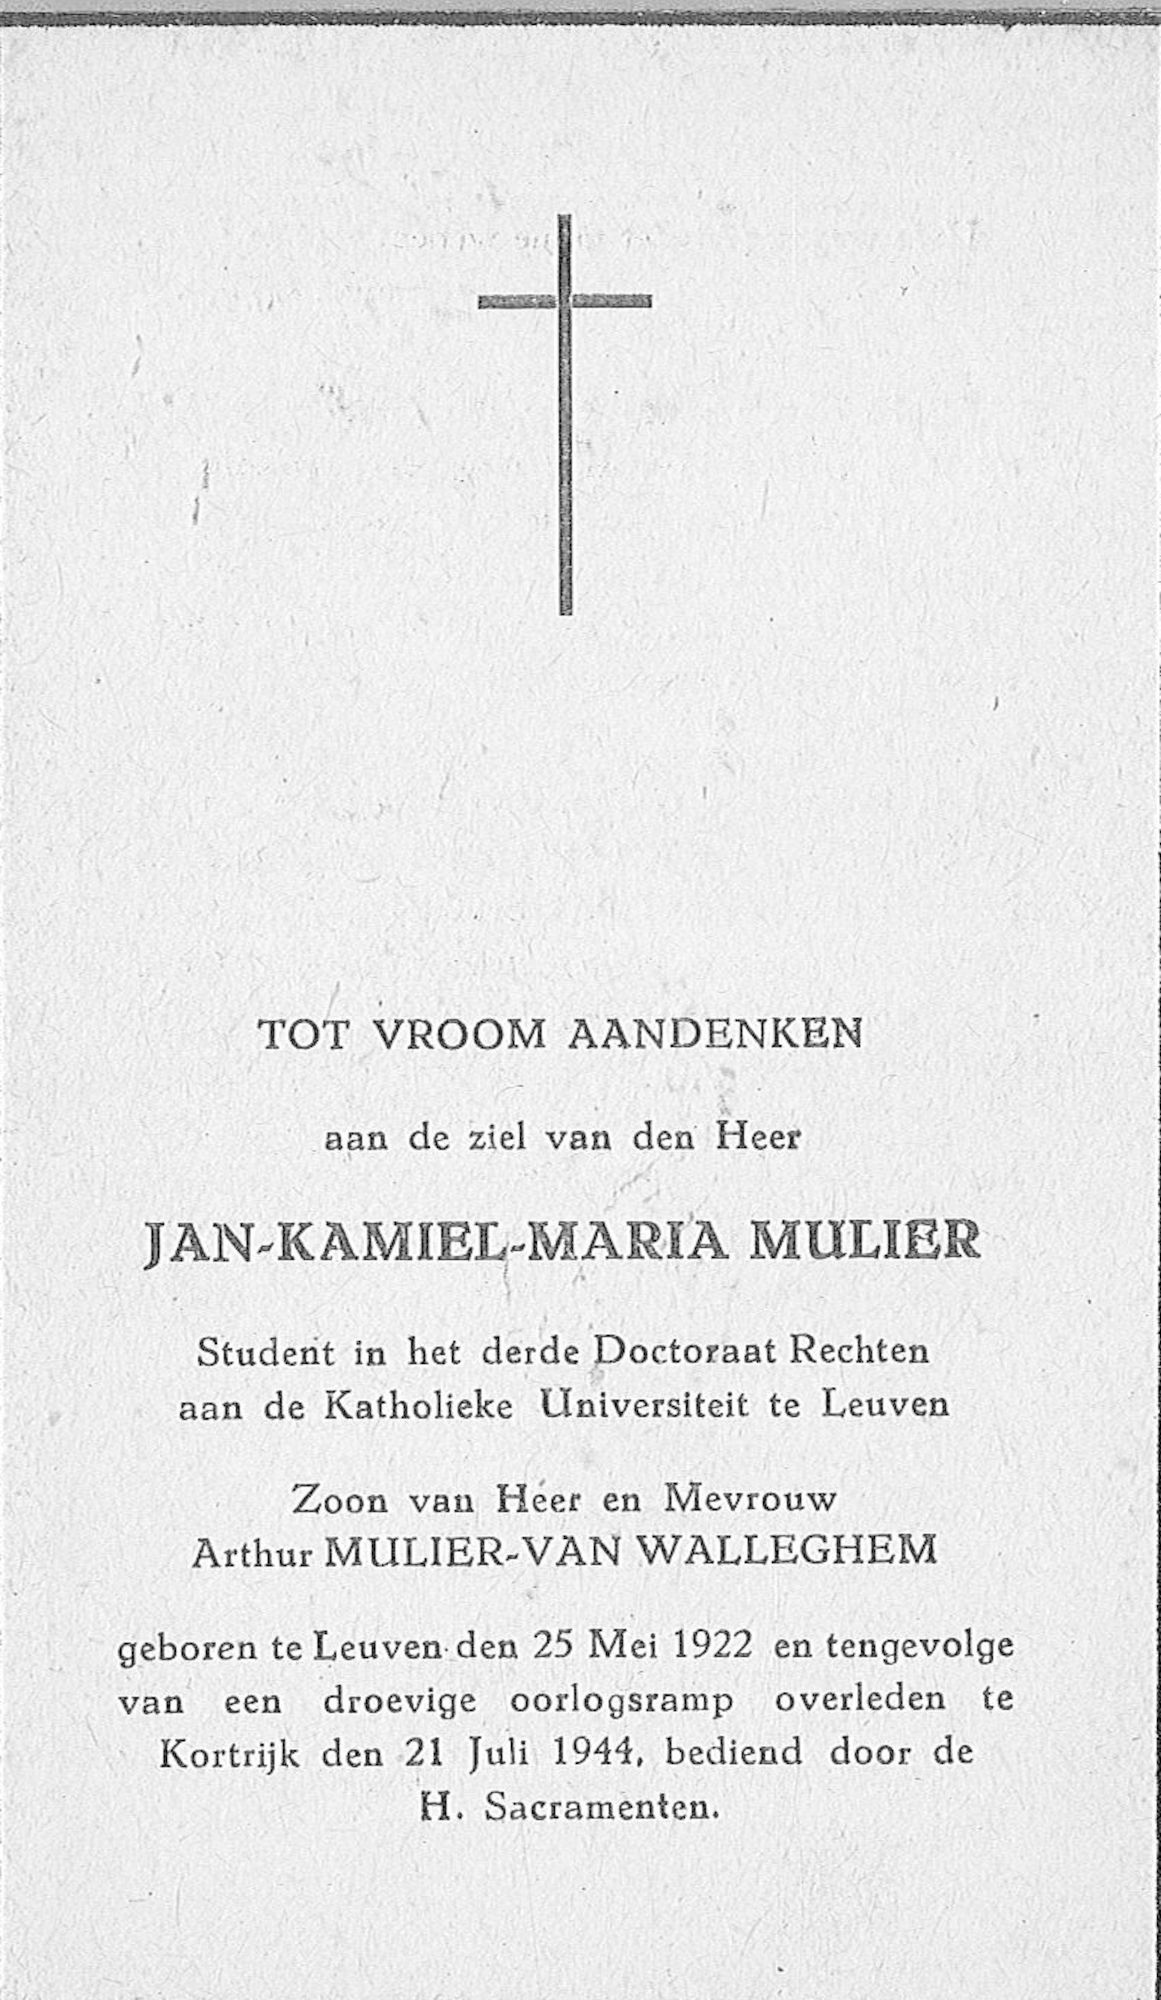 Jan-Kamiel-Maria Mulier